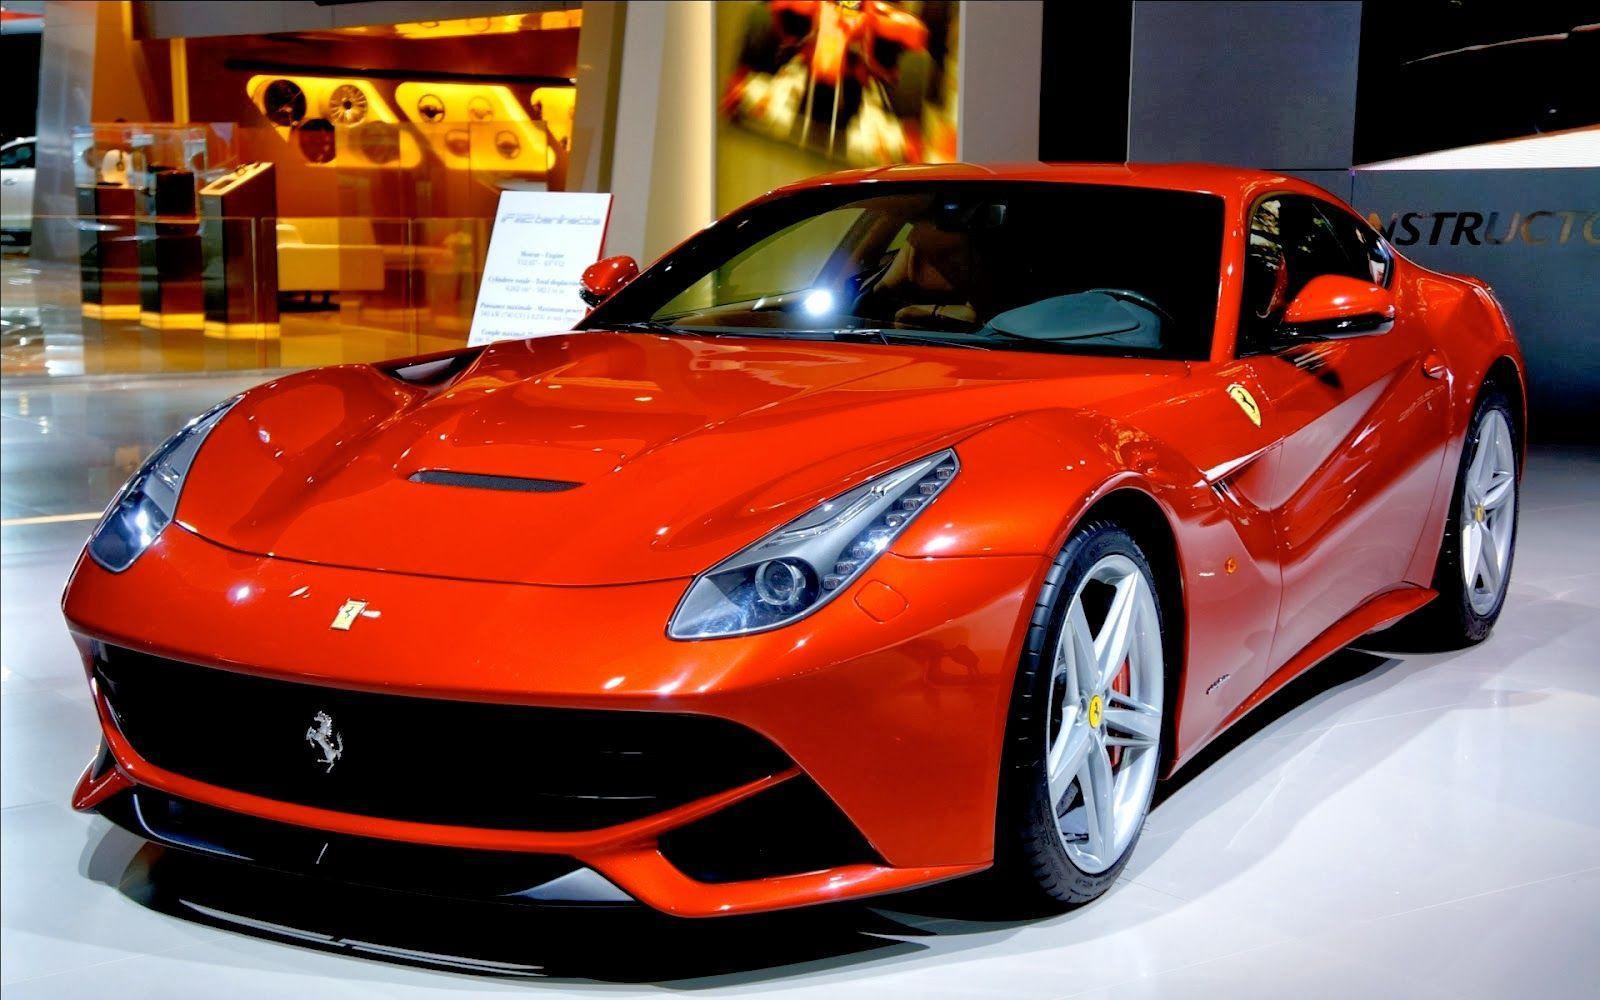 HD Ferrari Car Wallpapers 1080p